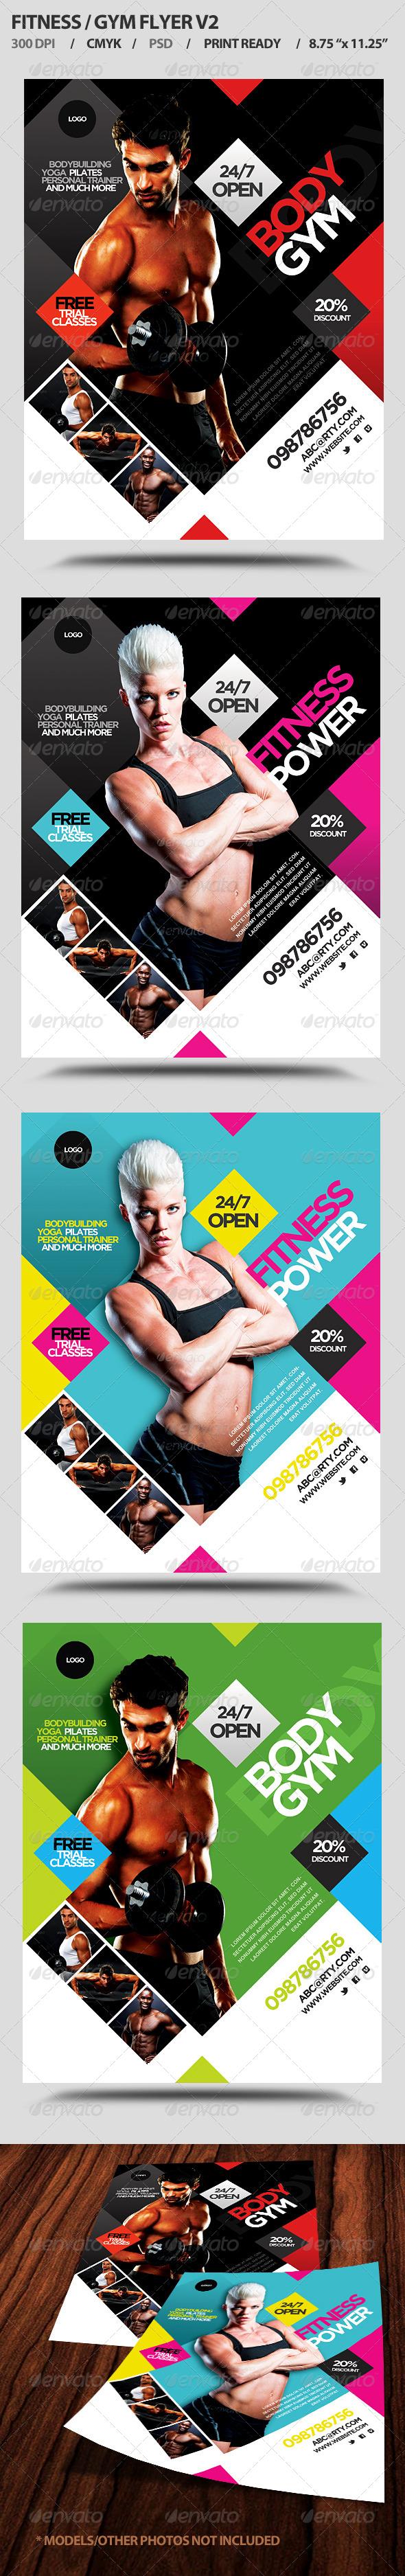 GraphicRiver Fitness Gym Business Promotion Flyer V2 4758614